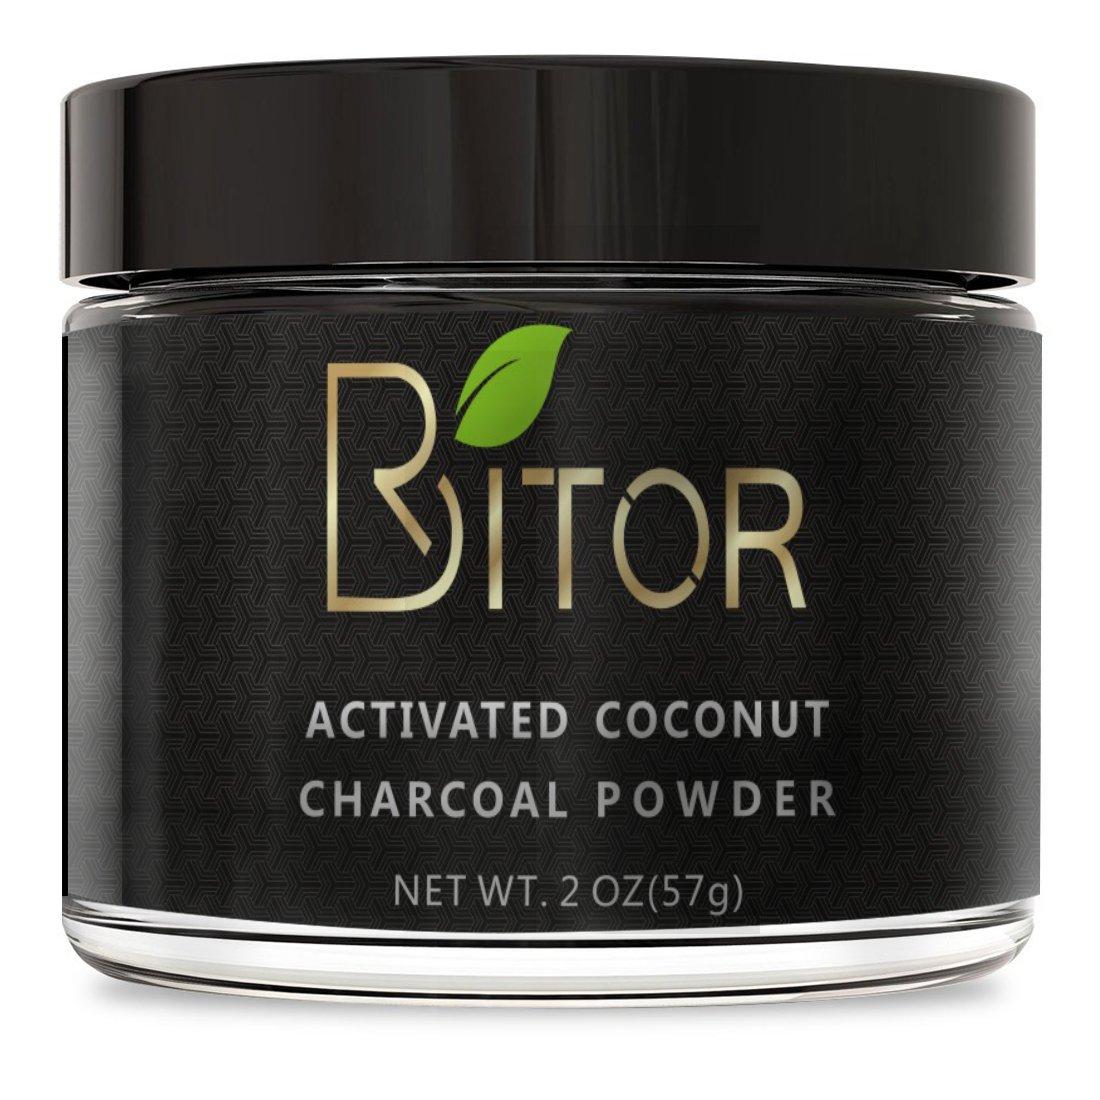 BRITOR Teeth Whitening Charcoal Powder Natural – 2OZ